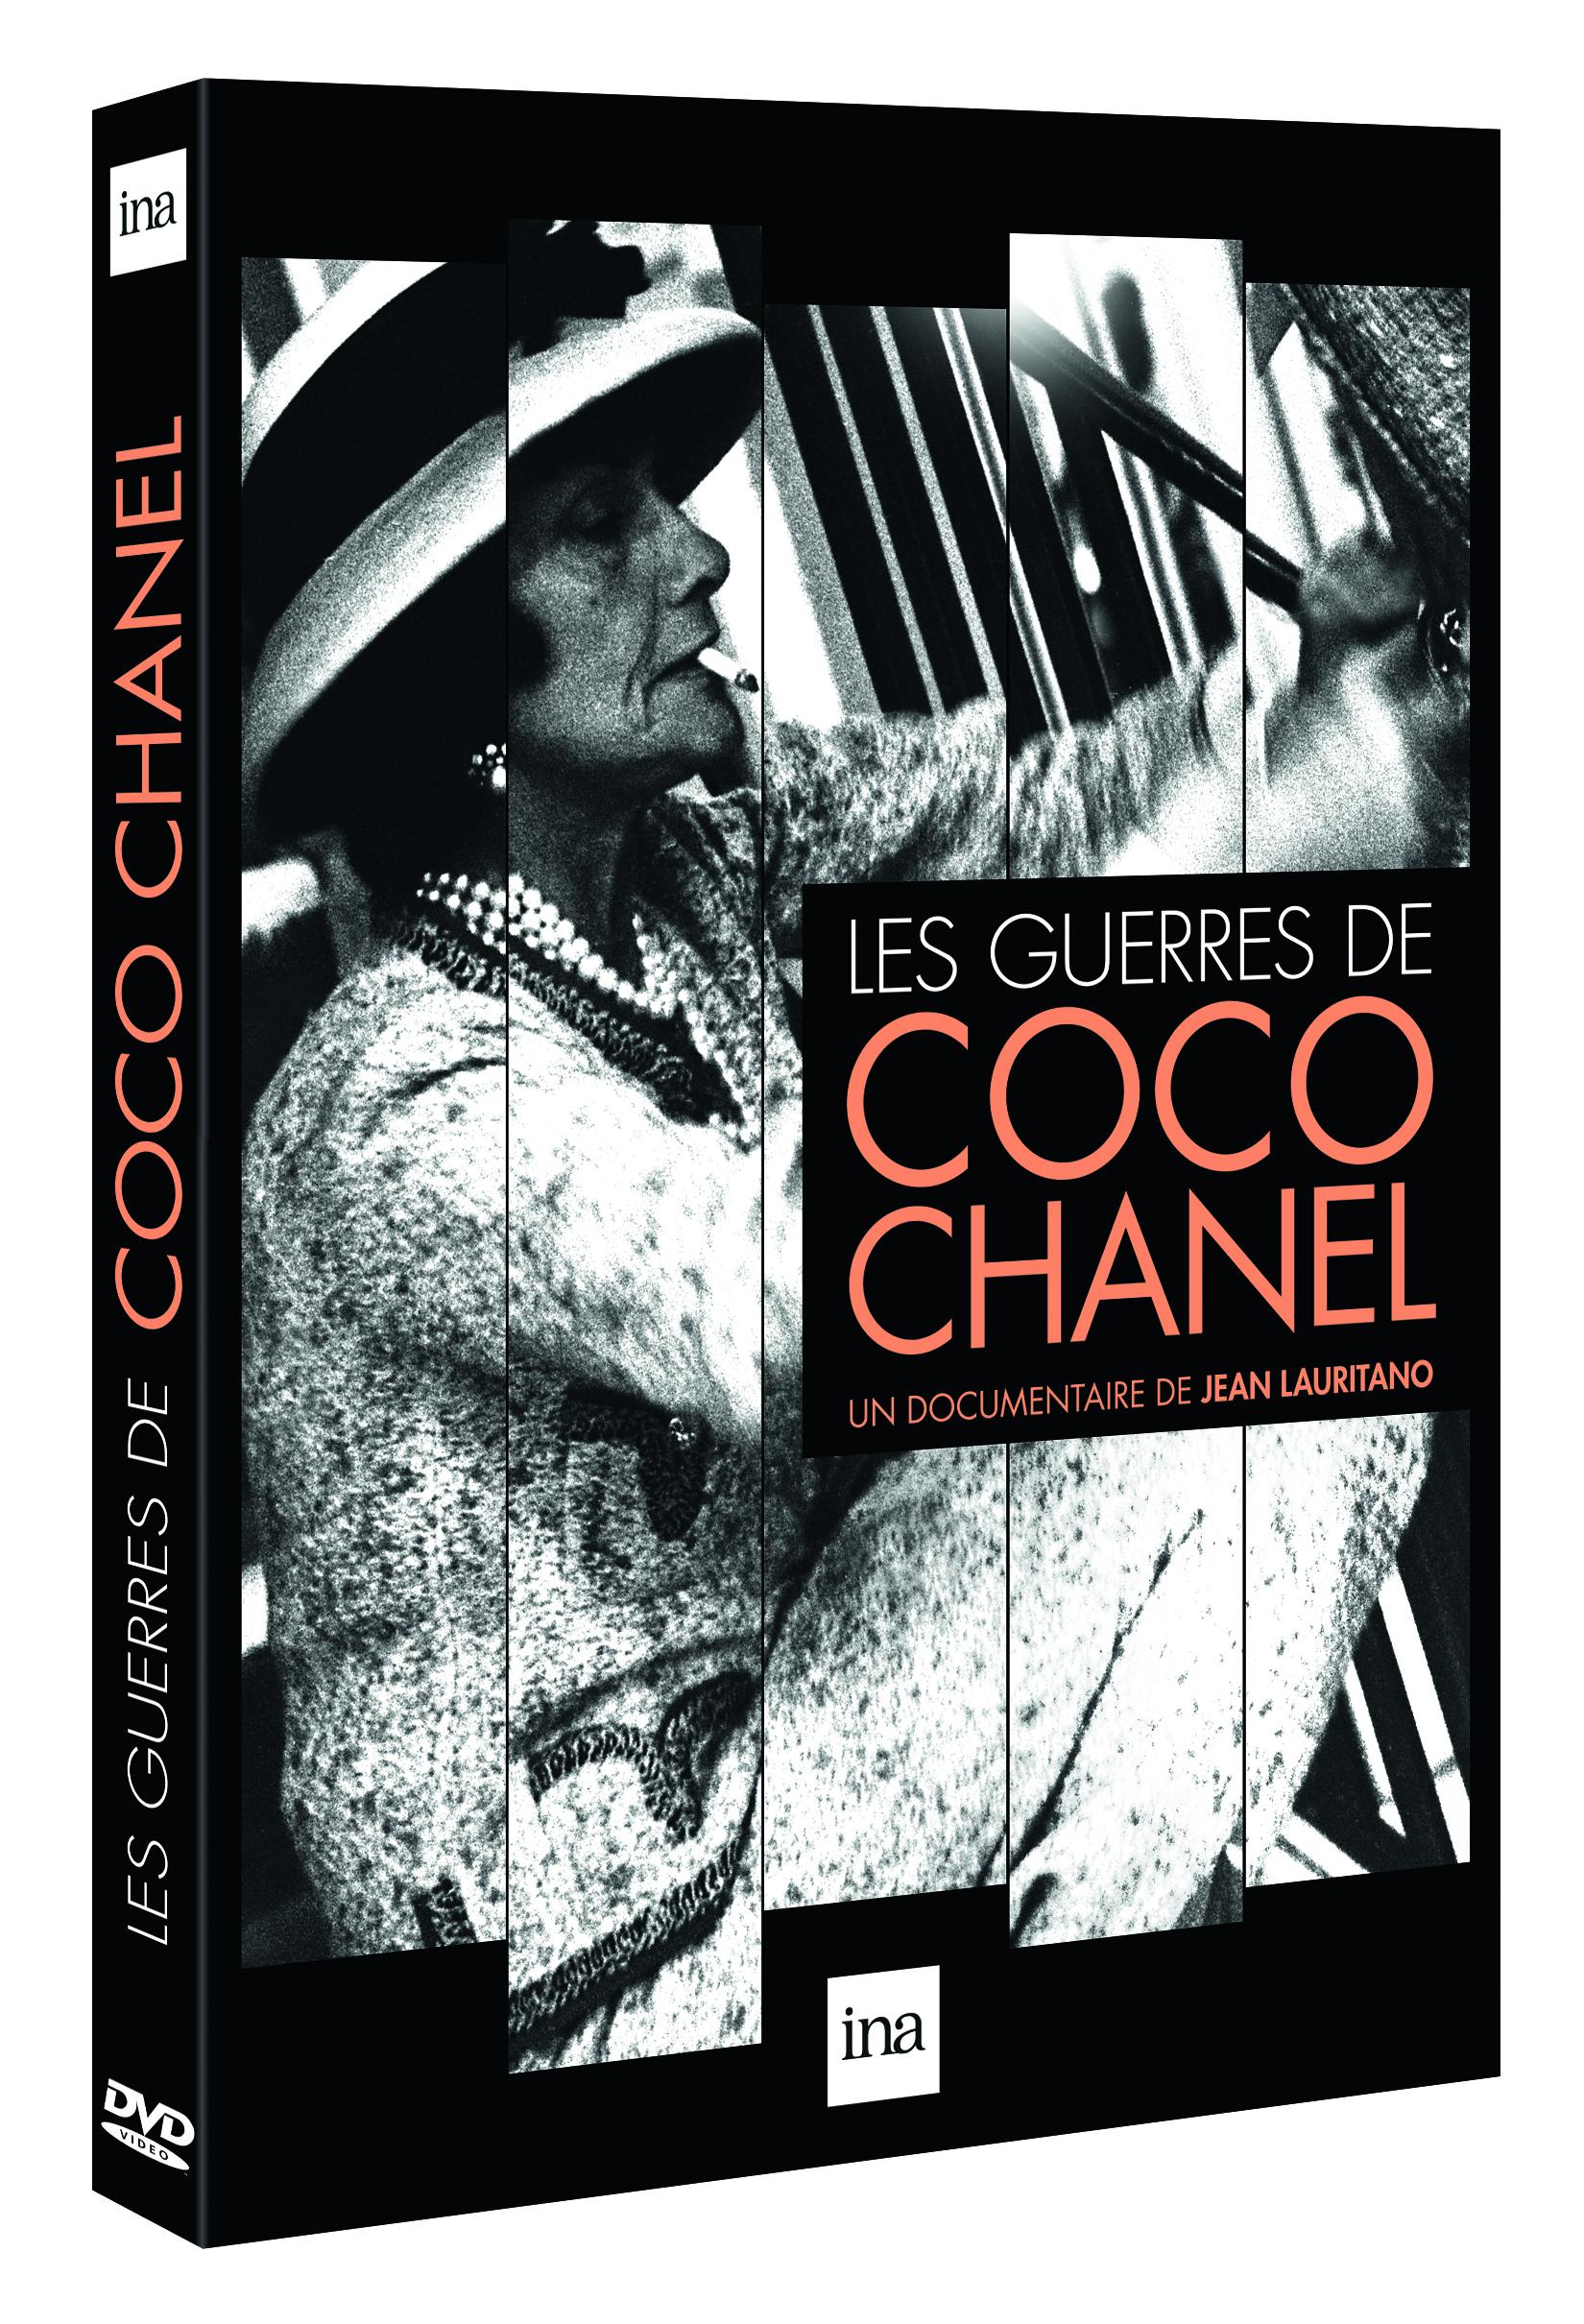 Coco ChanelPackshot-jpg